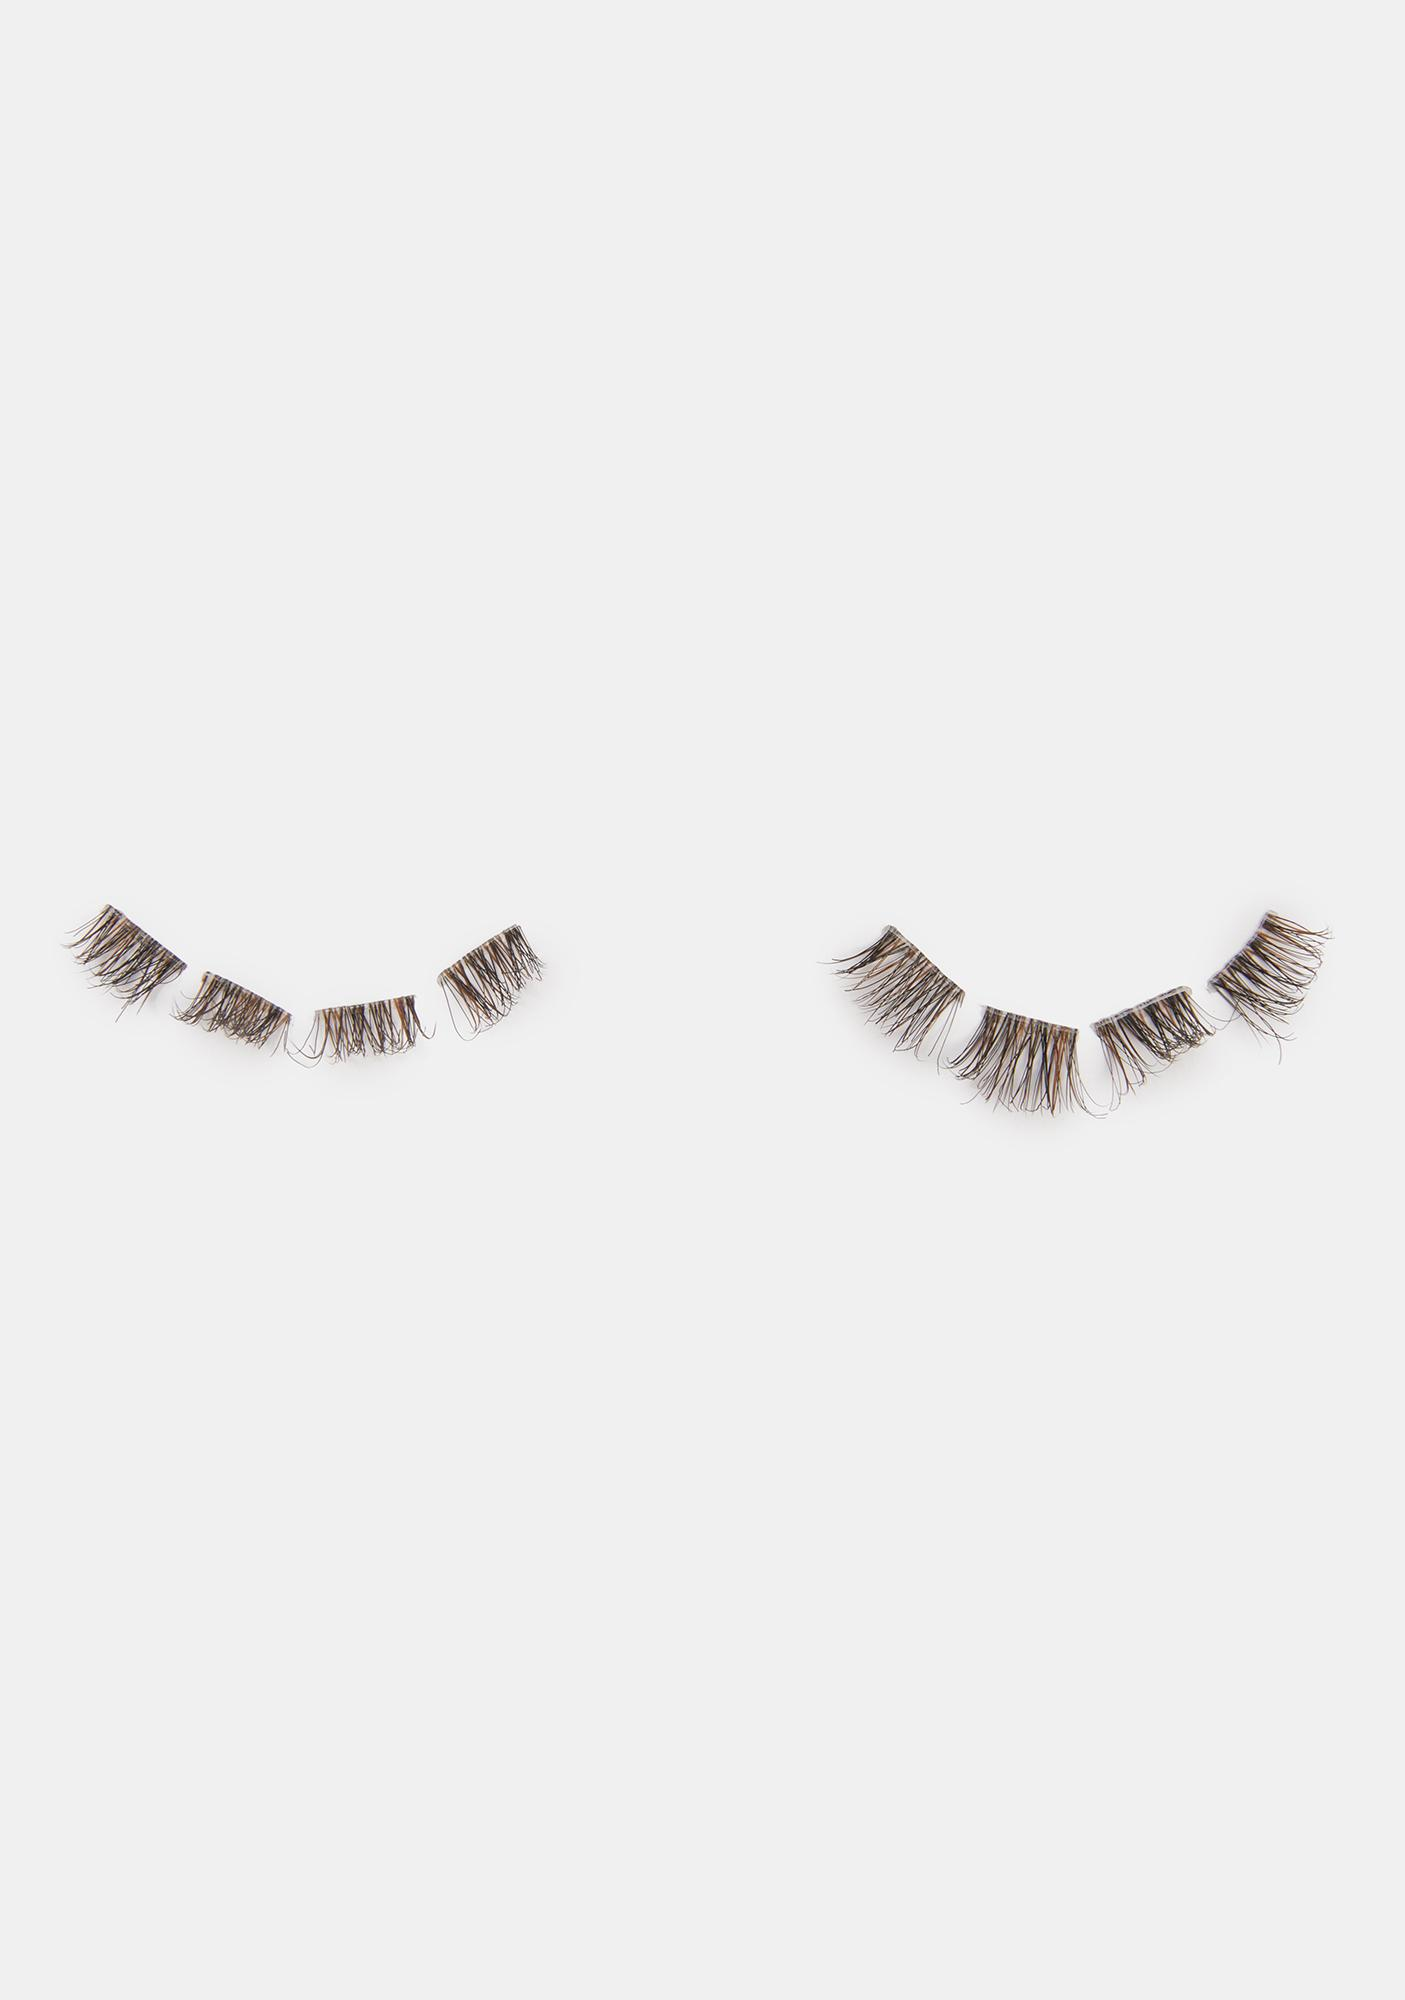 LASHES IN A BOX N°25 Natural Hair Eyelashes